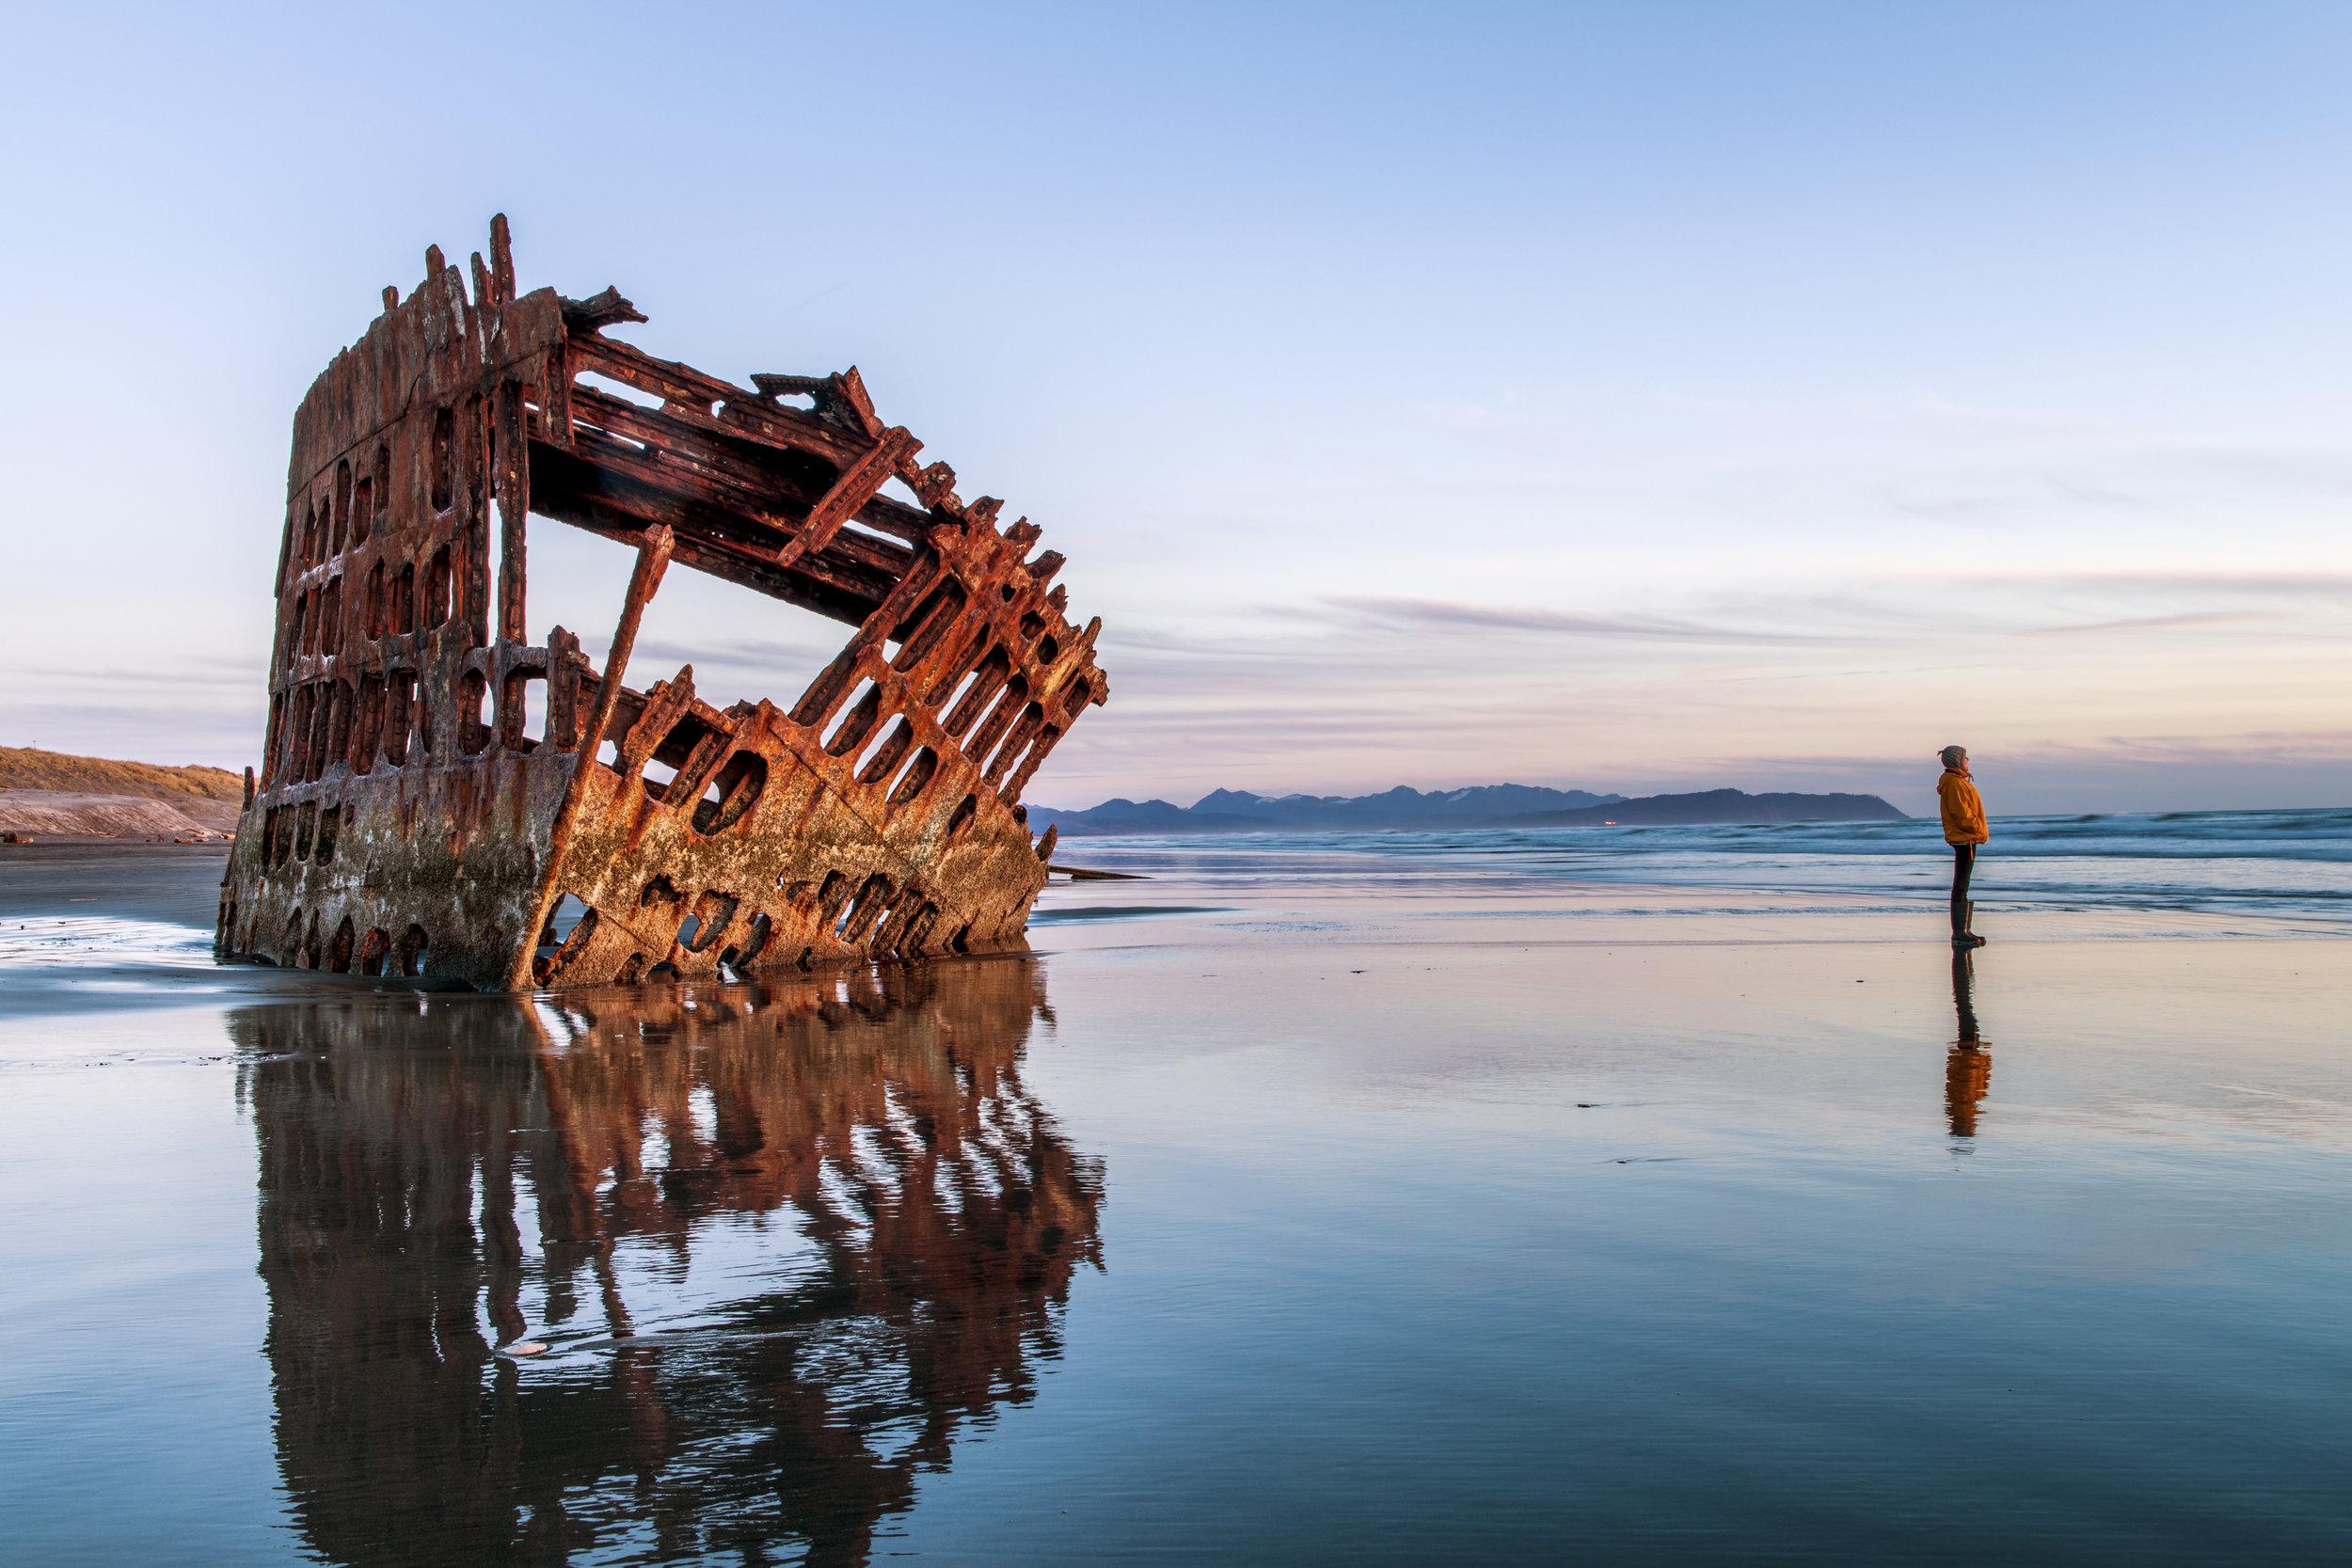 Shipwreck Explorer 2